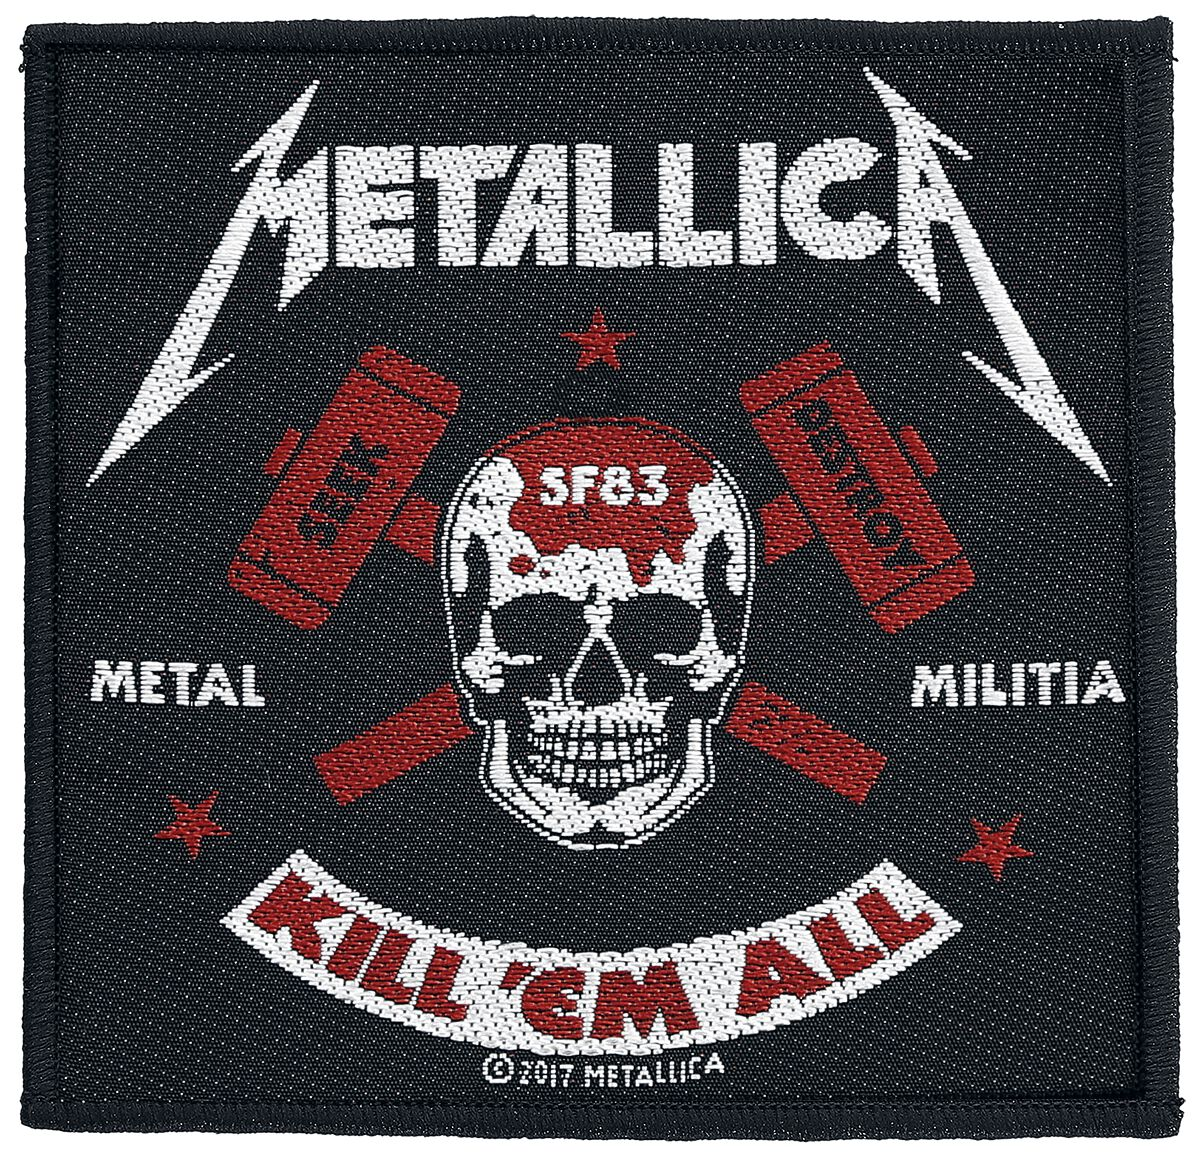 Metallica Metal Militia - None - Mehrfarbig